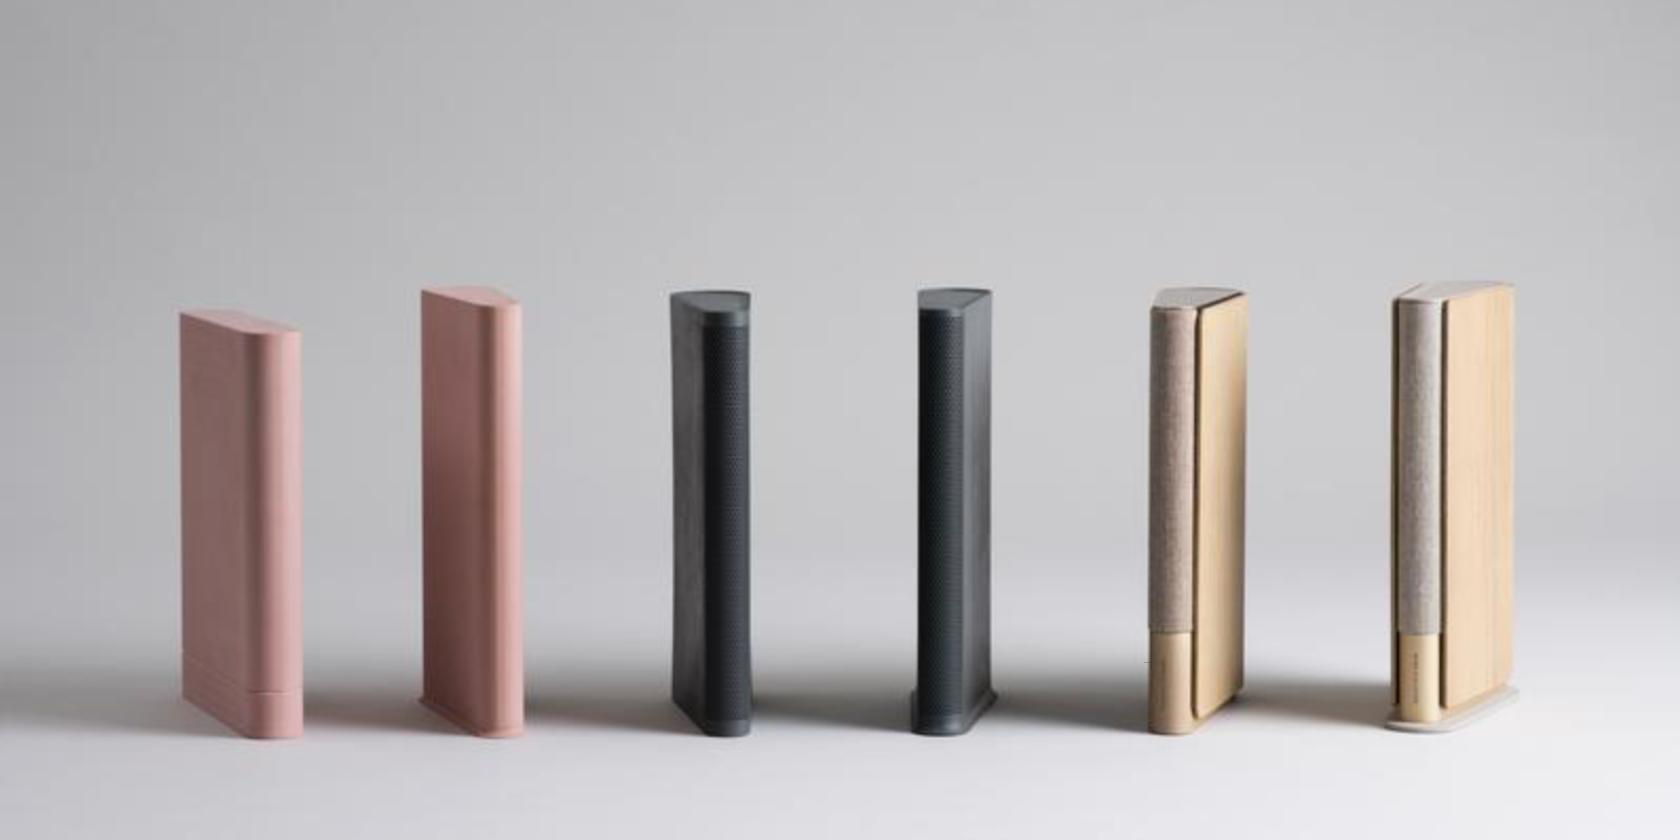 Bang & Olufsen's New Speaker Is Designed to Blend Into Your Bookshelf